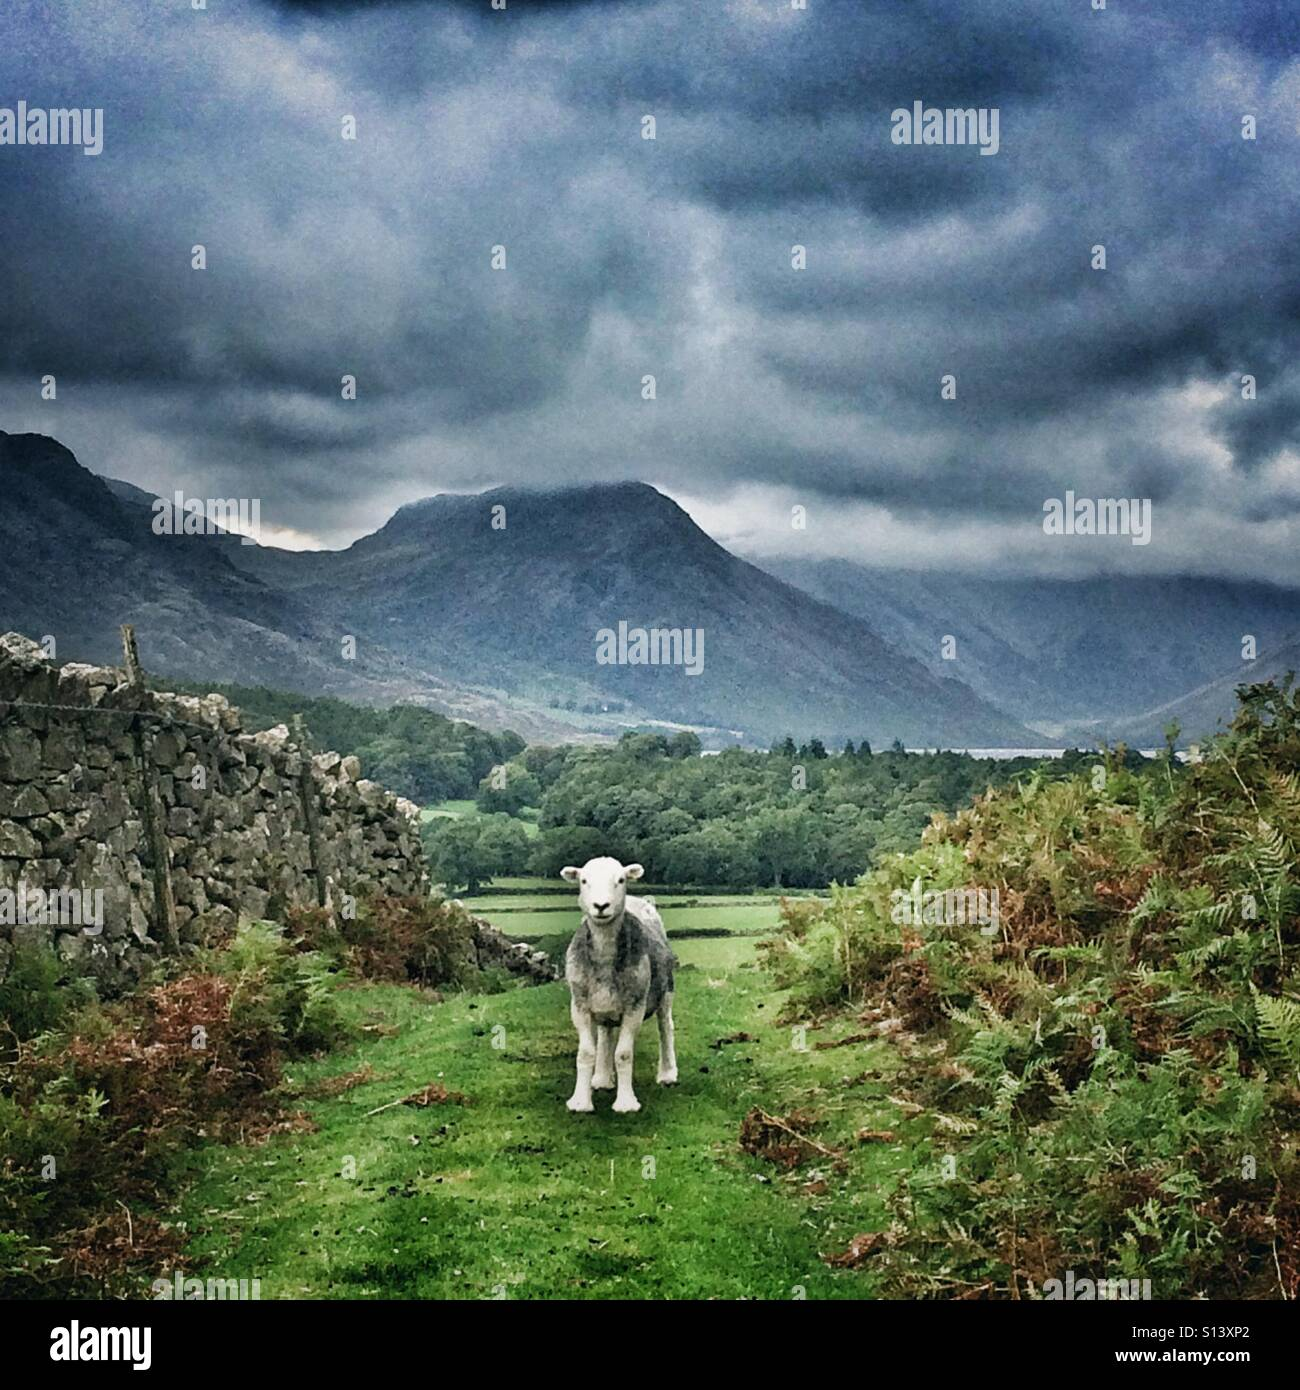 A Herdwick sheep in Cumbria, Lake District - Stock Image